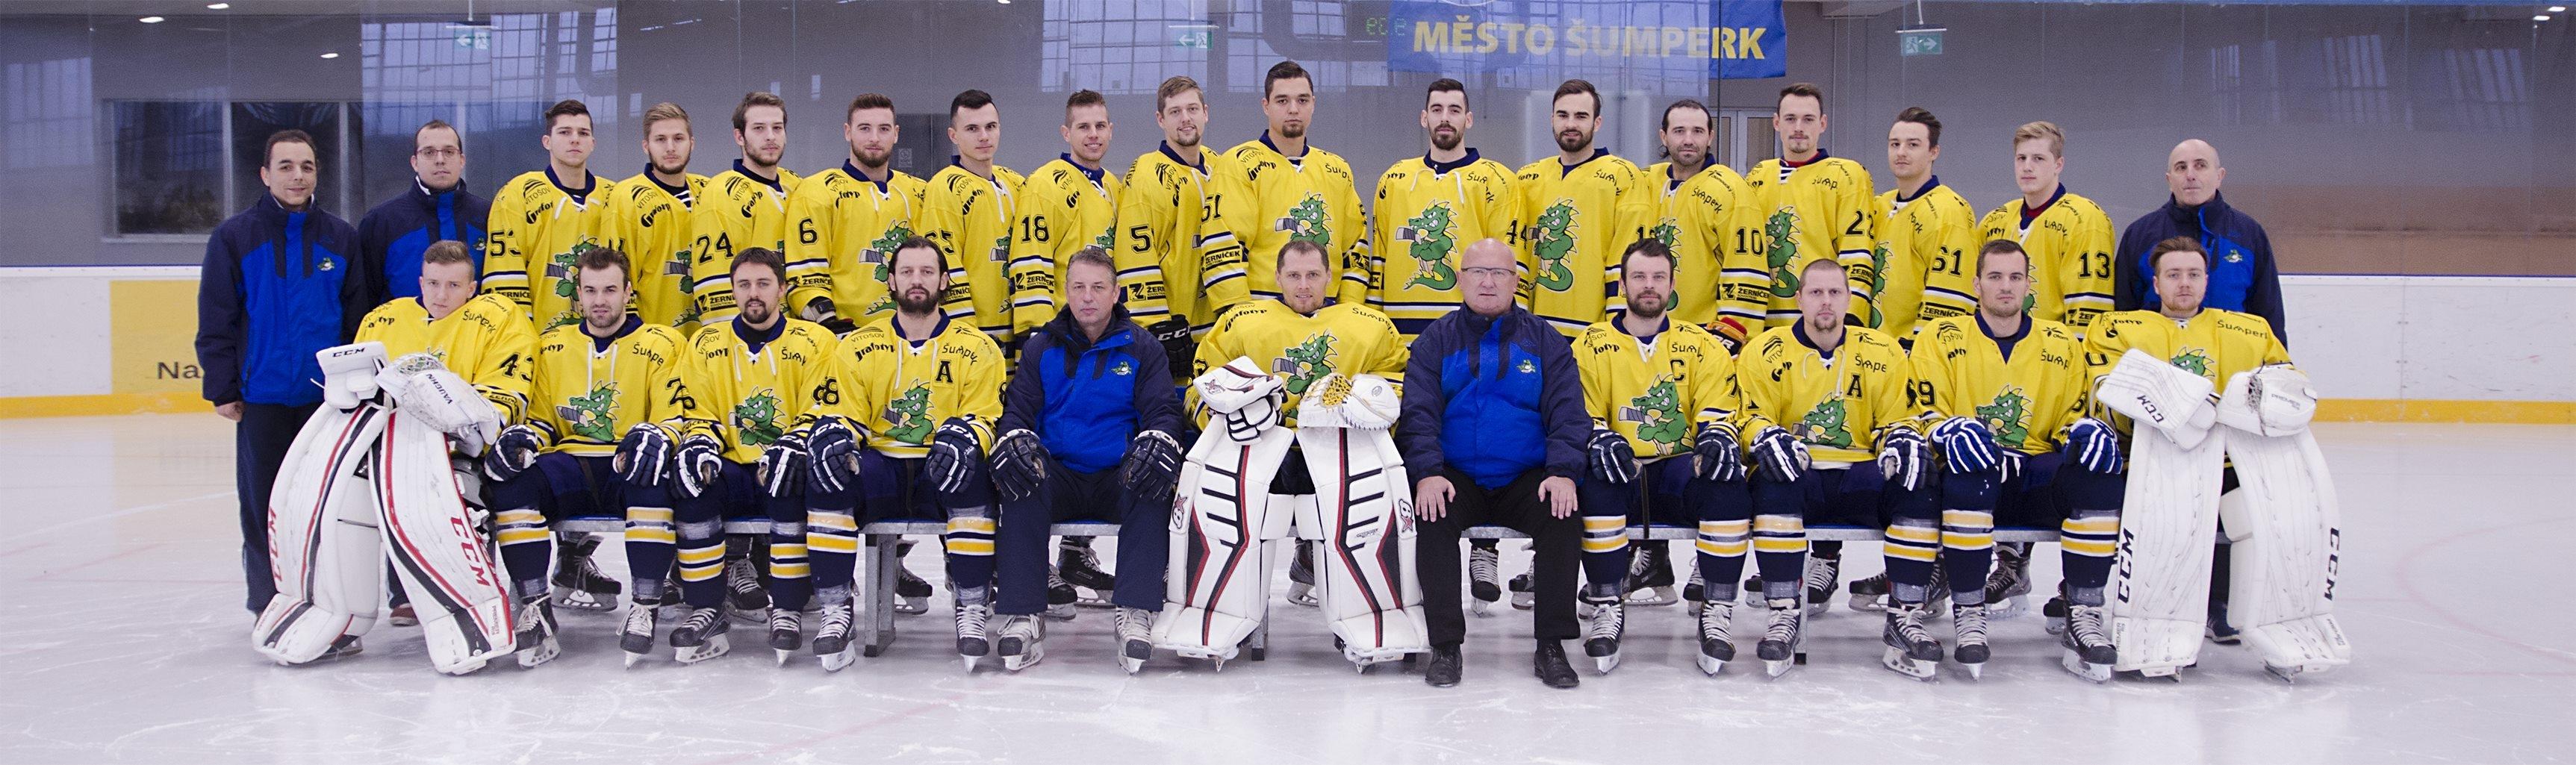 Draci Šumperk na začátku sezony zdroj foto: klub